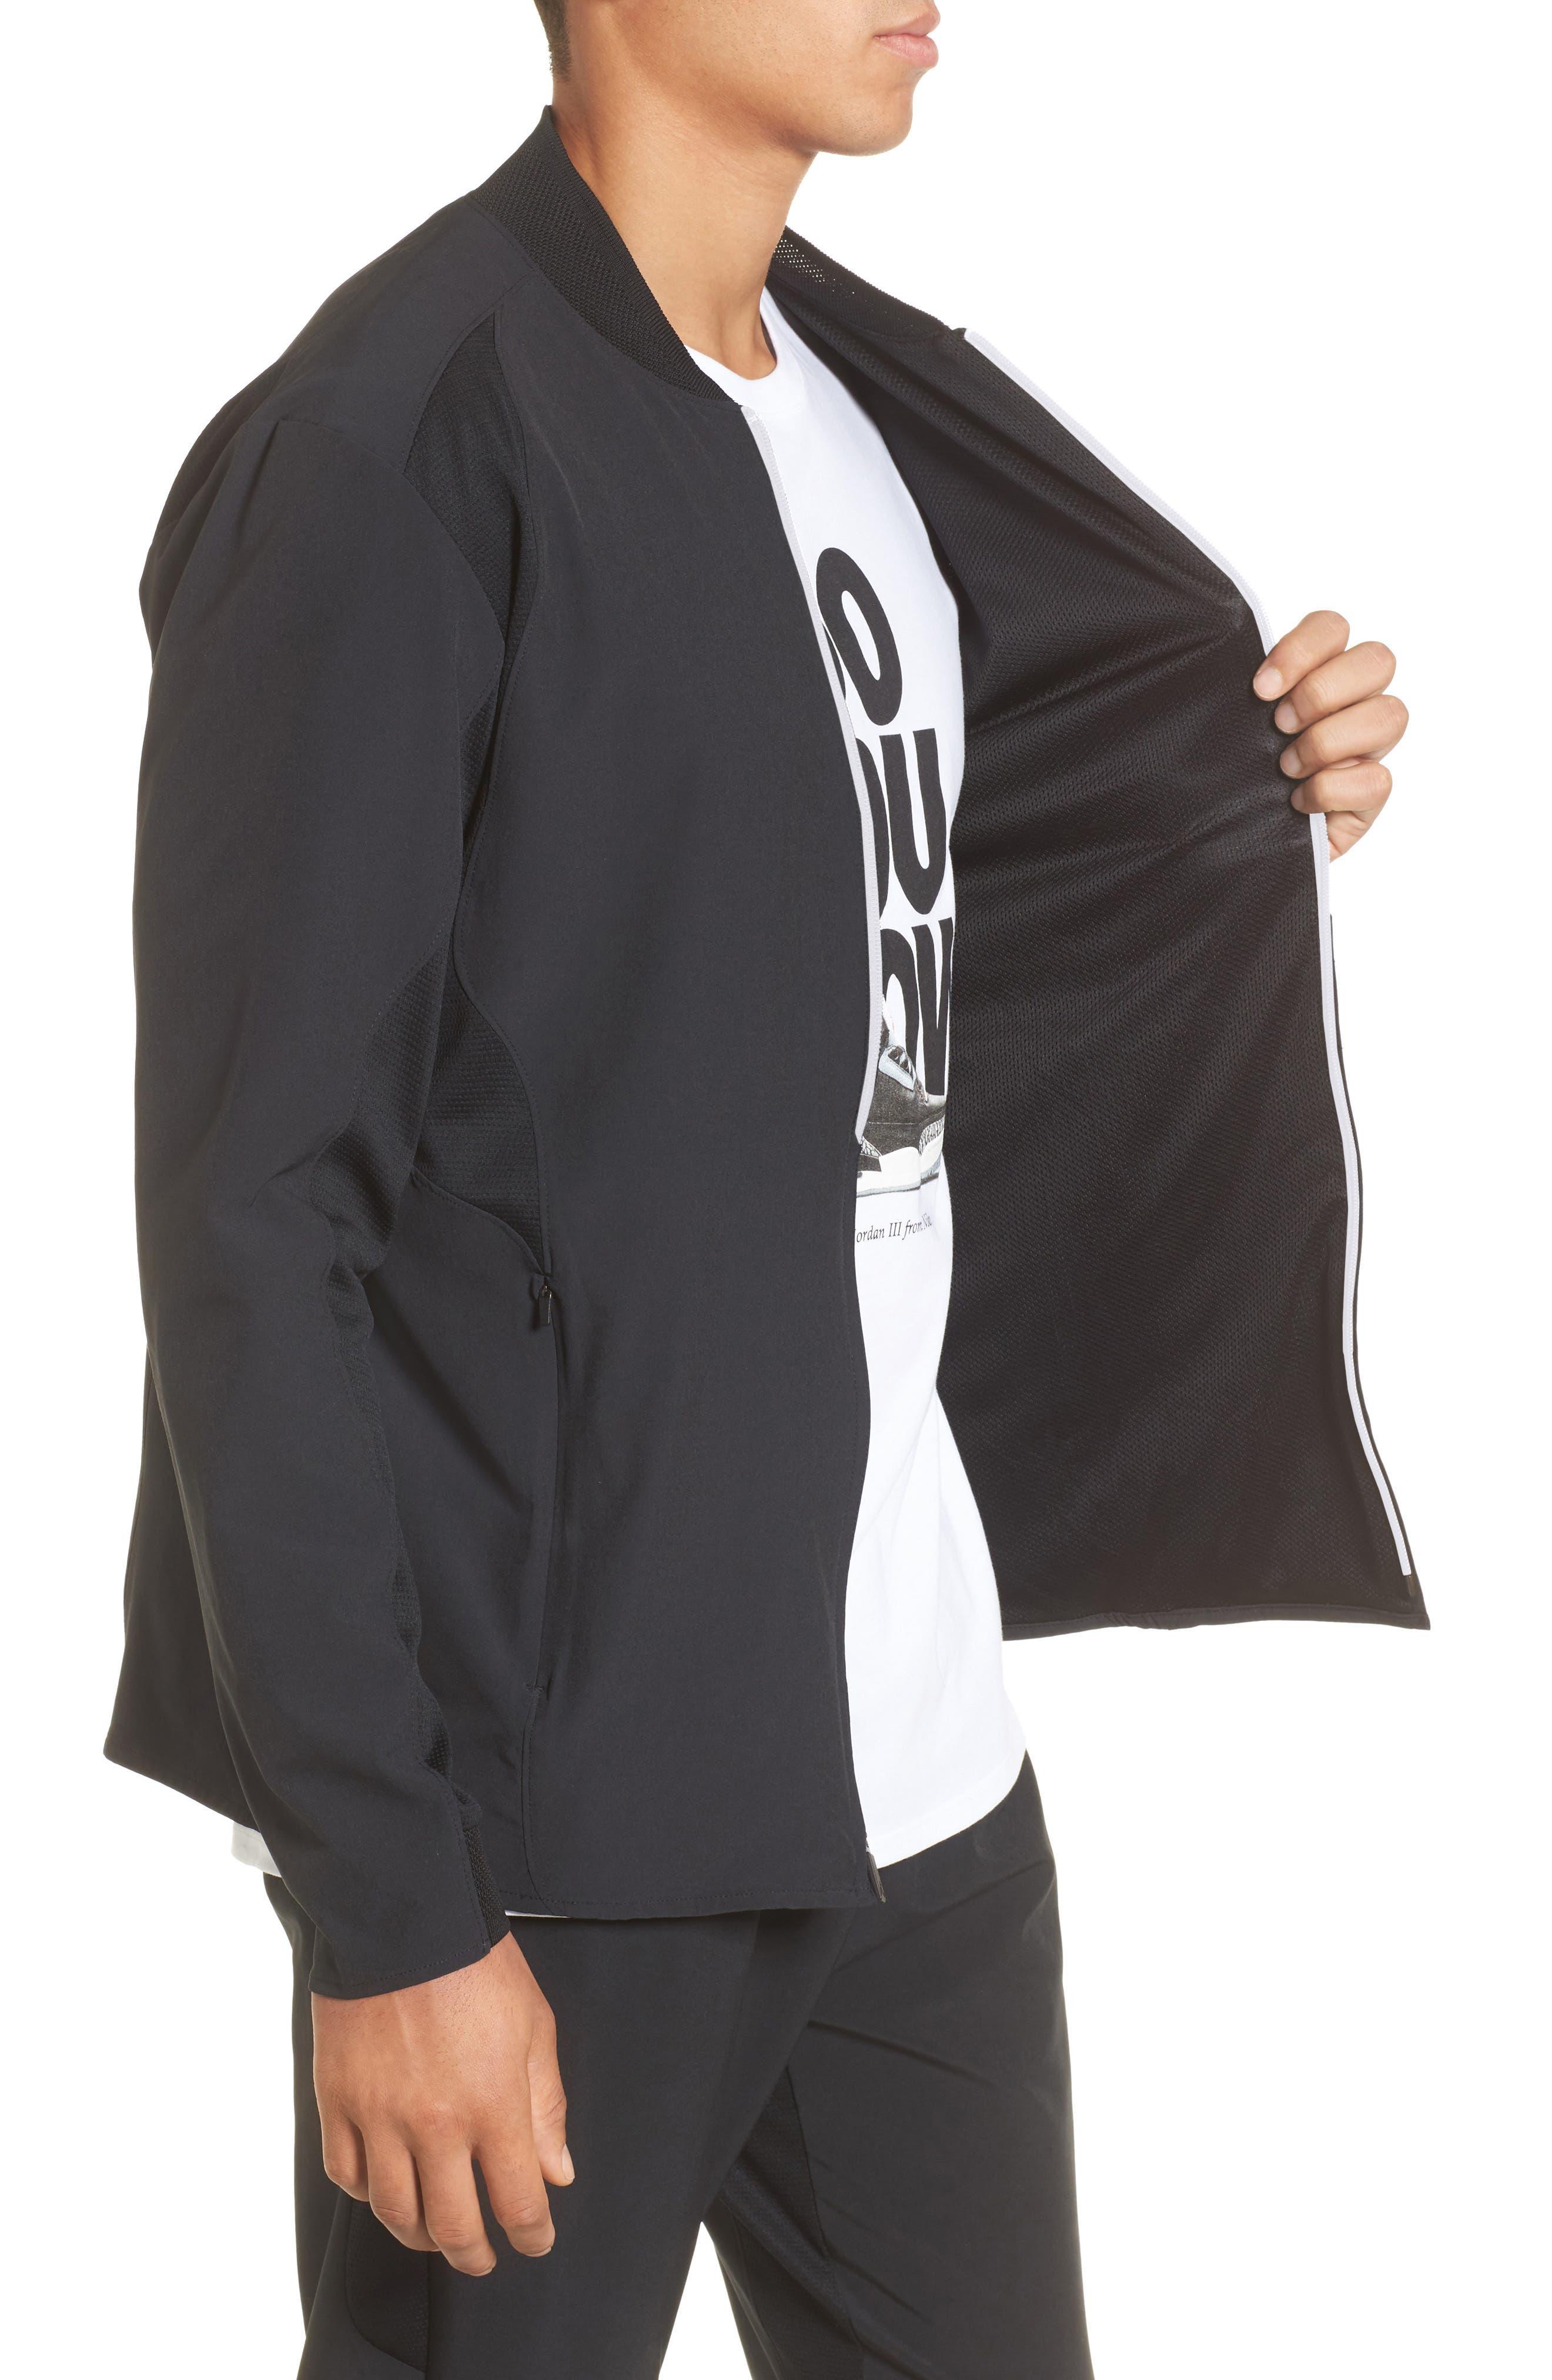 23 Alpha Dry Jacket,                             Alternate thumbnail 4, color,                             Black/ White